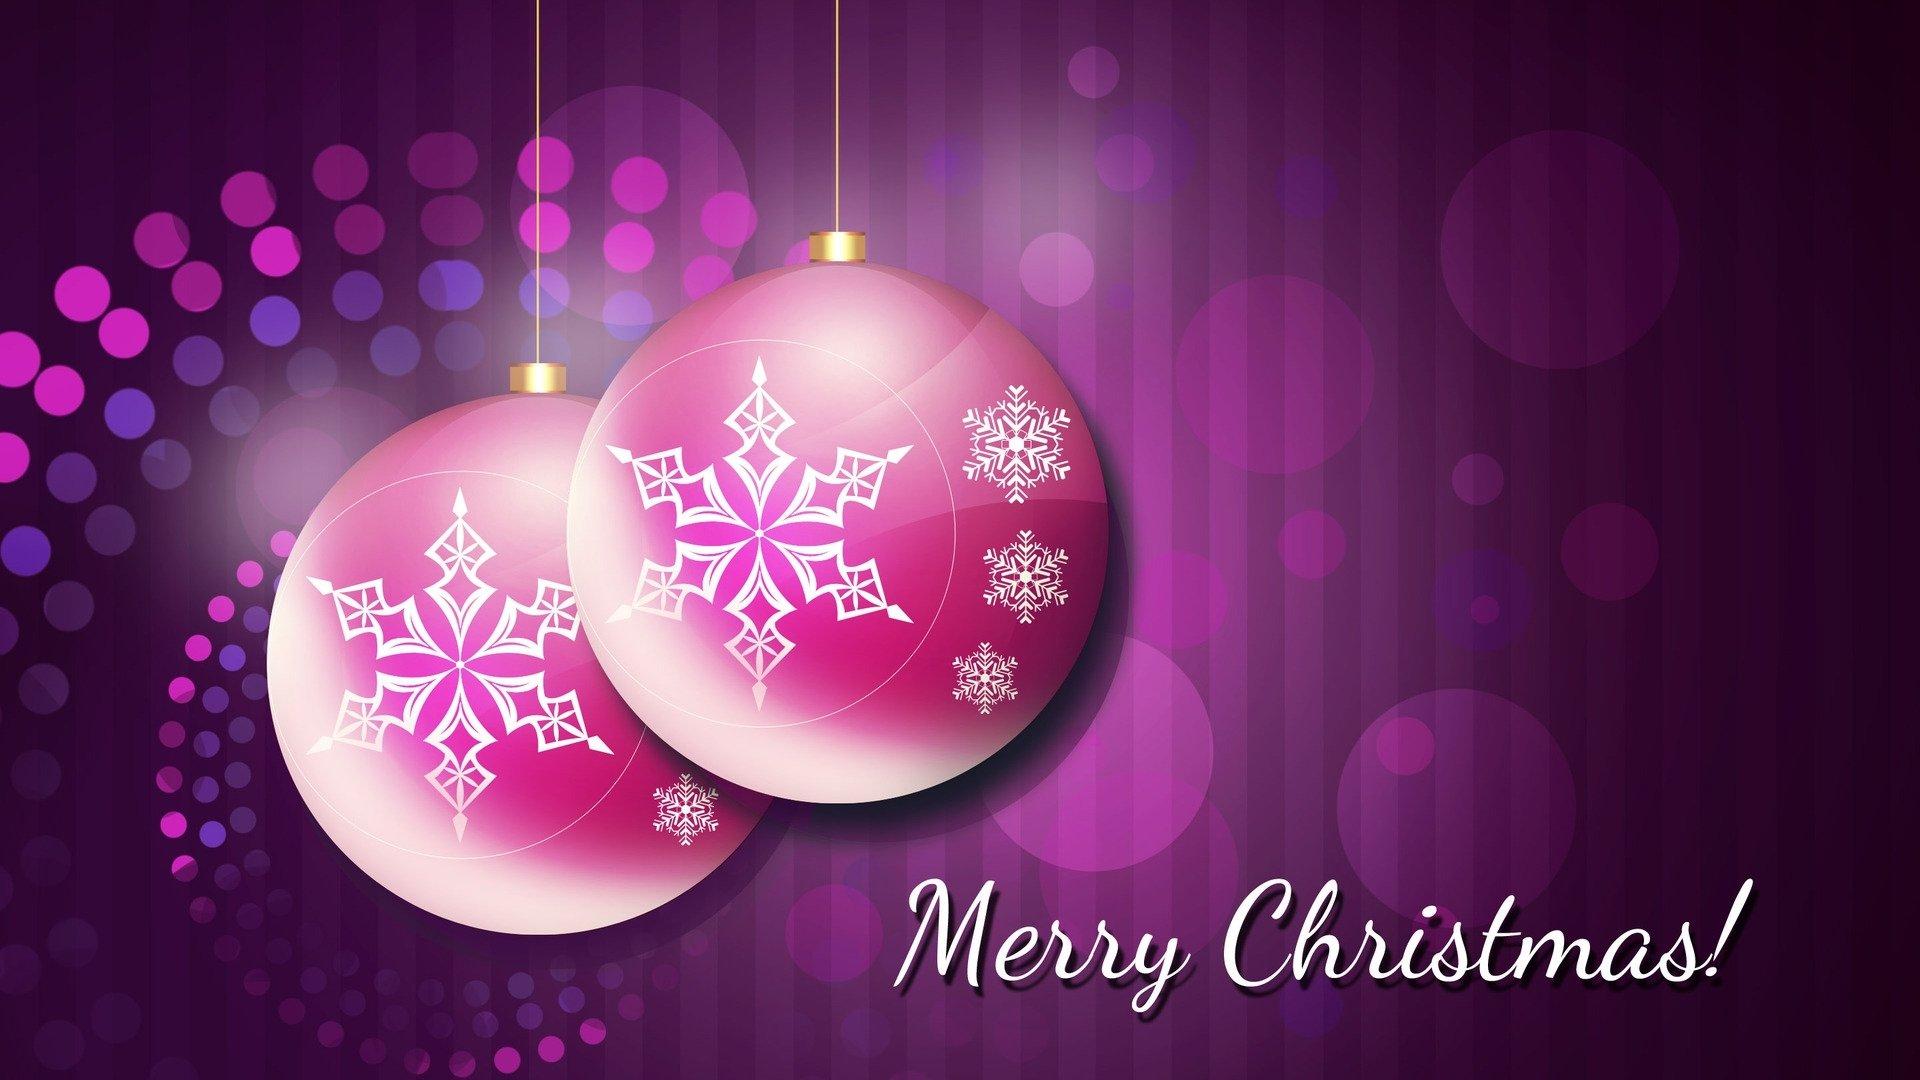 Holiday - Christmas  Holiday Christmas Ornaments Purple Merry Christmas Wallpaper